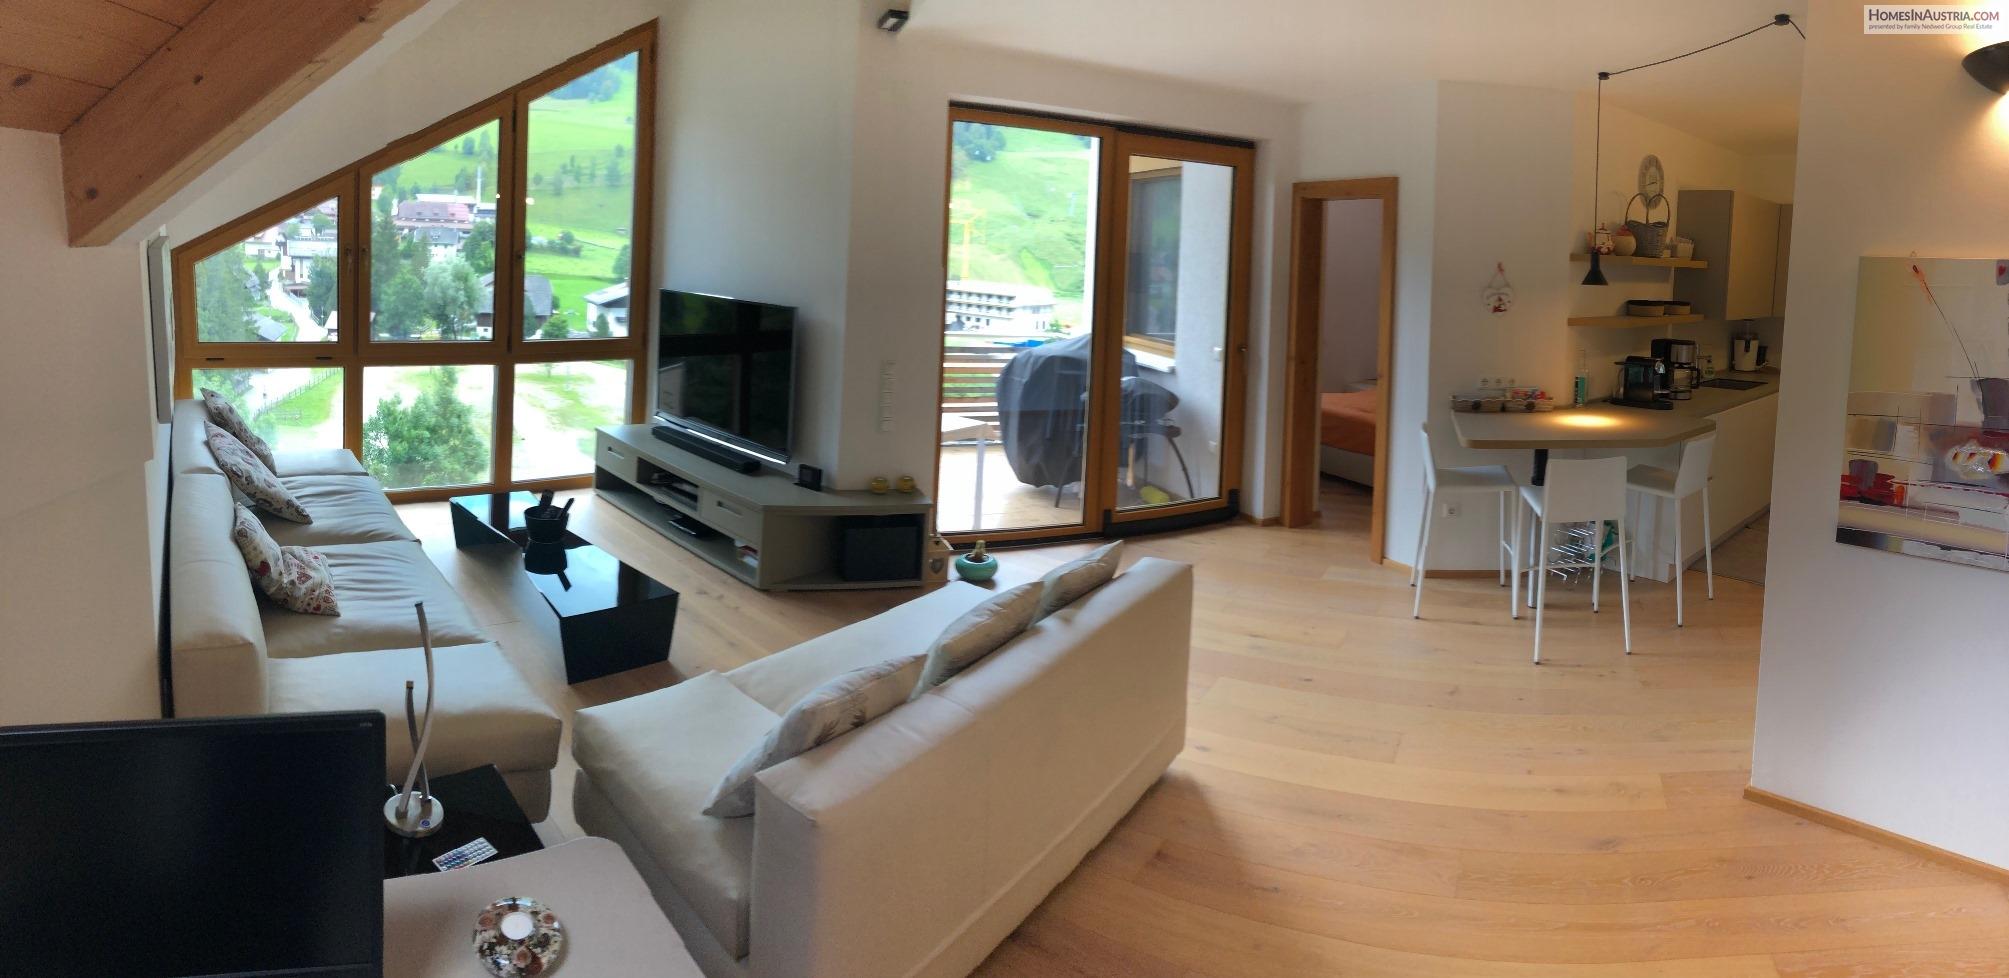 Bad Kleinkirchheim, Carinthia, Beautiful Apartment (KAISERBURGBLICK), Best Location, Sunny, Balcony